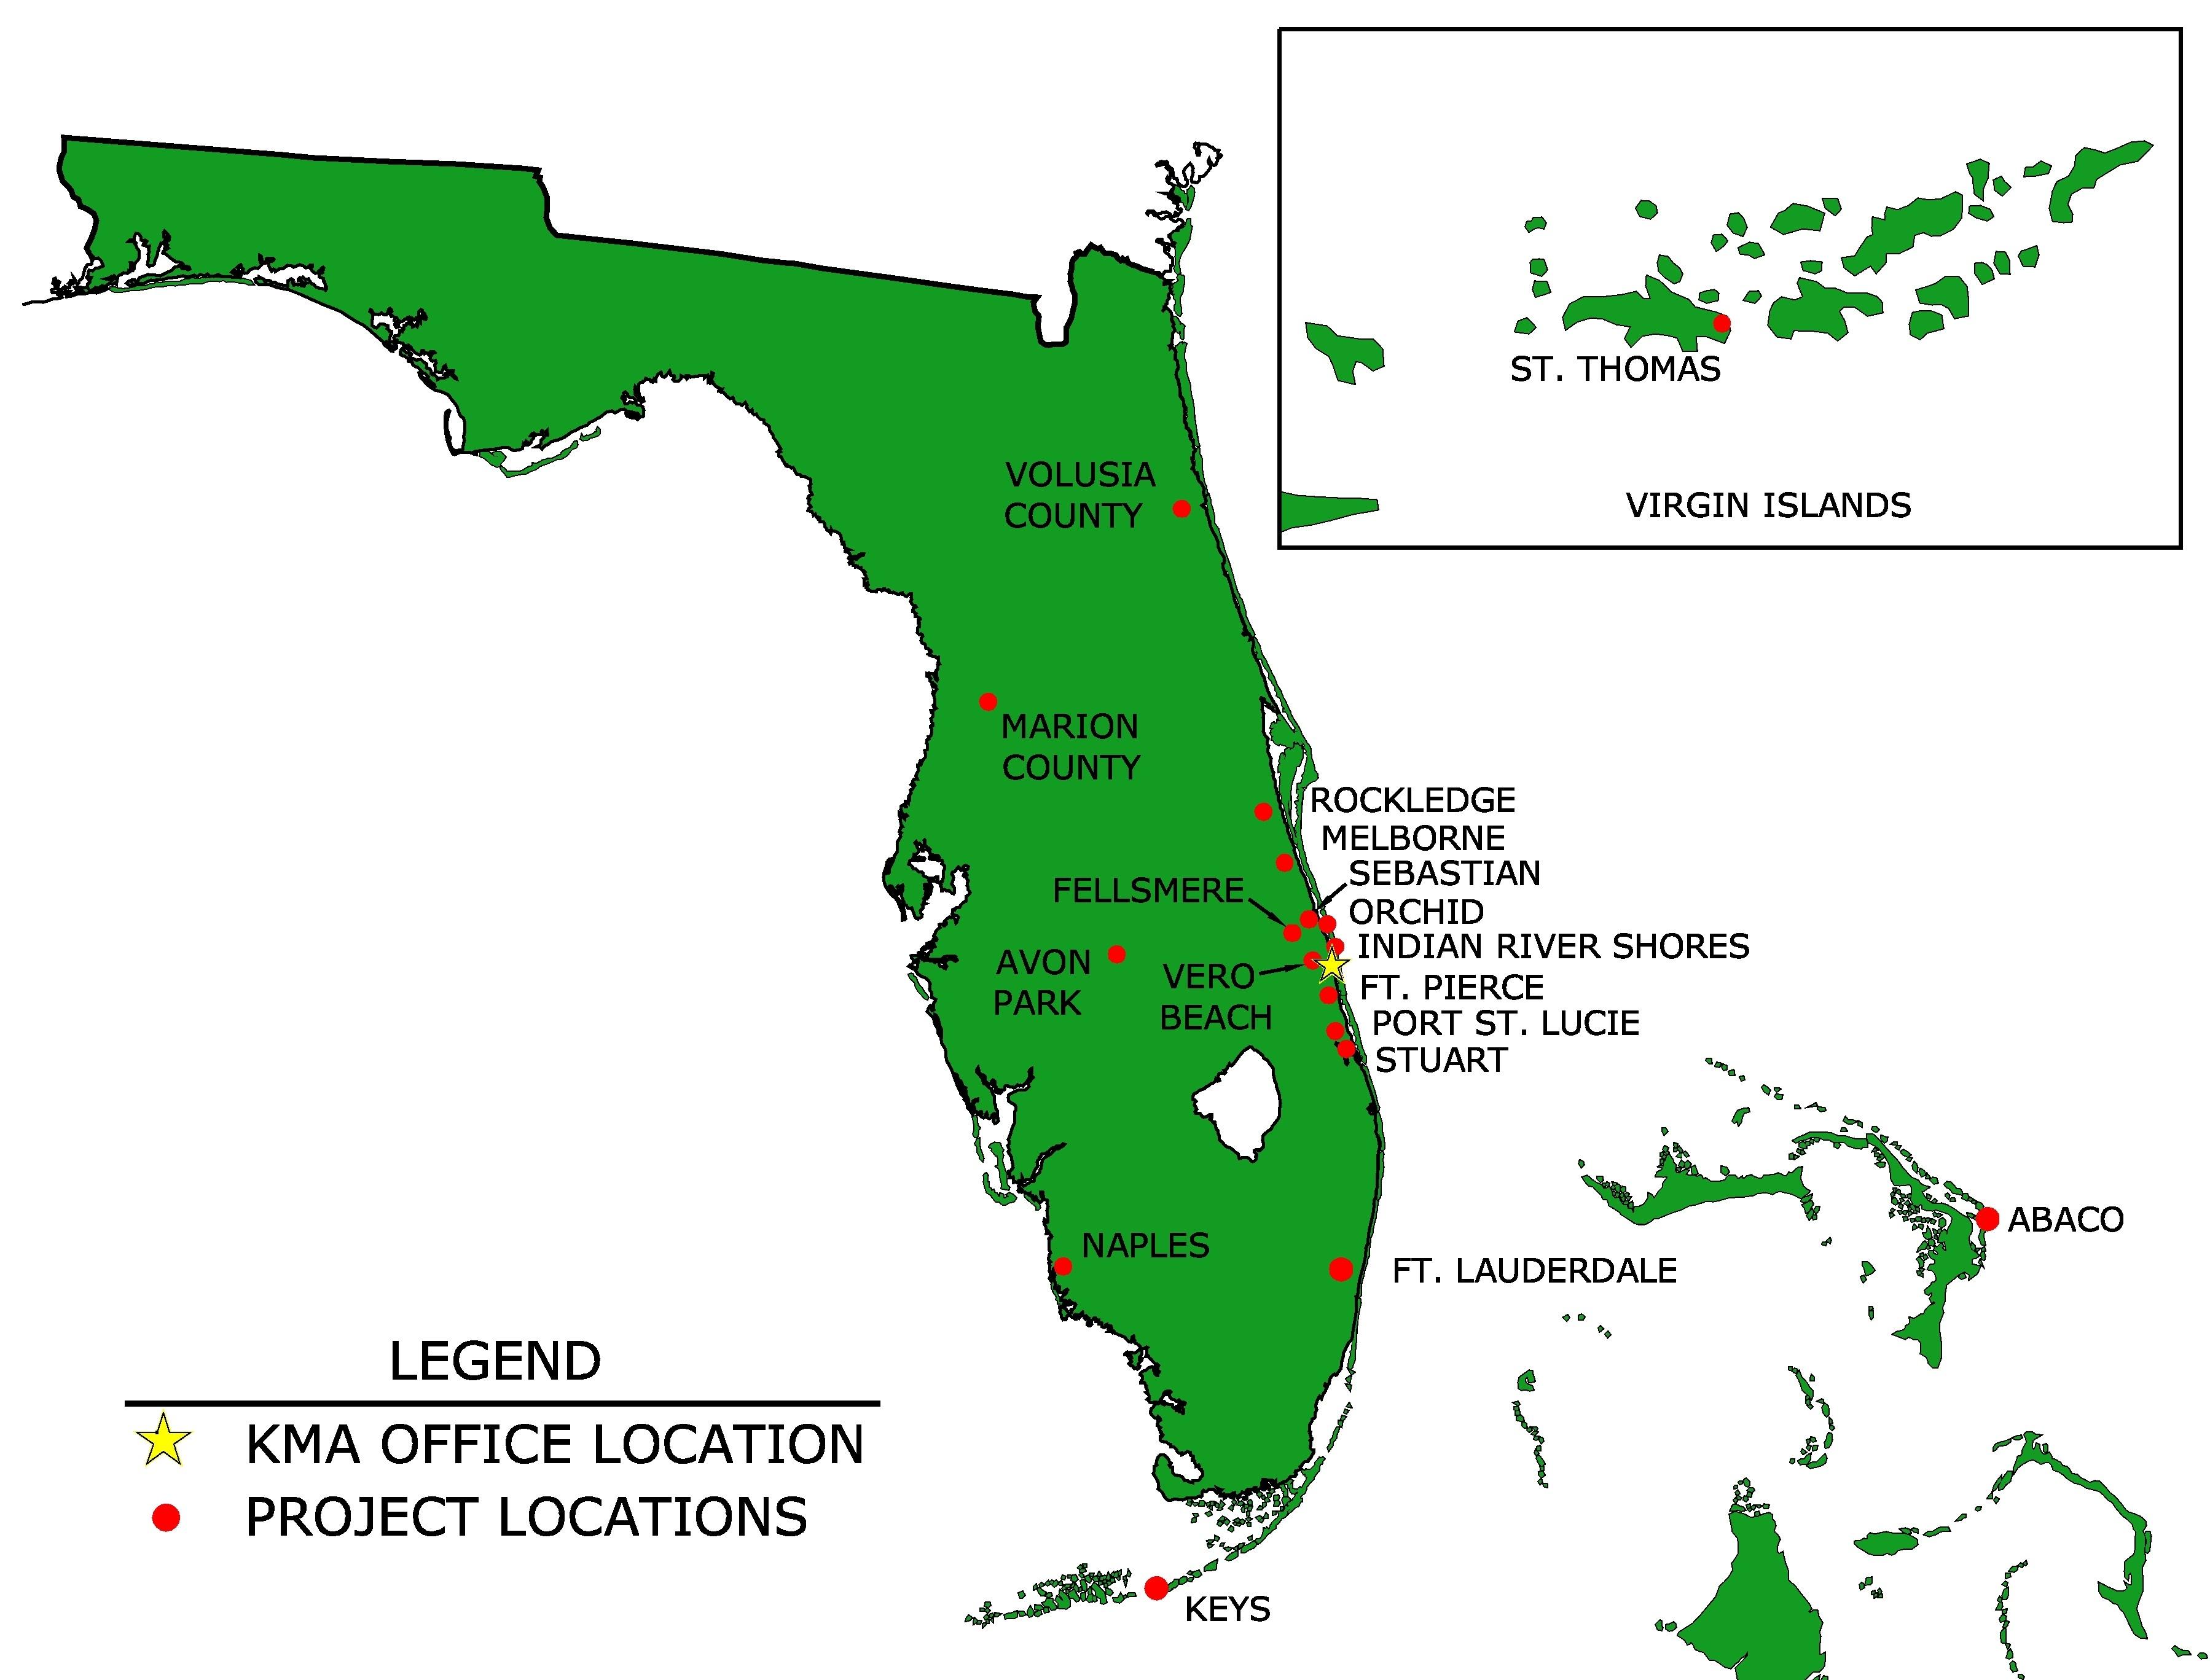 10 Hottest Vero Beach Florida Map 2018 | Beach Destination - Vero Beach Fl Map Of Florida